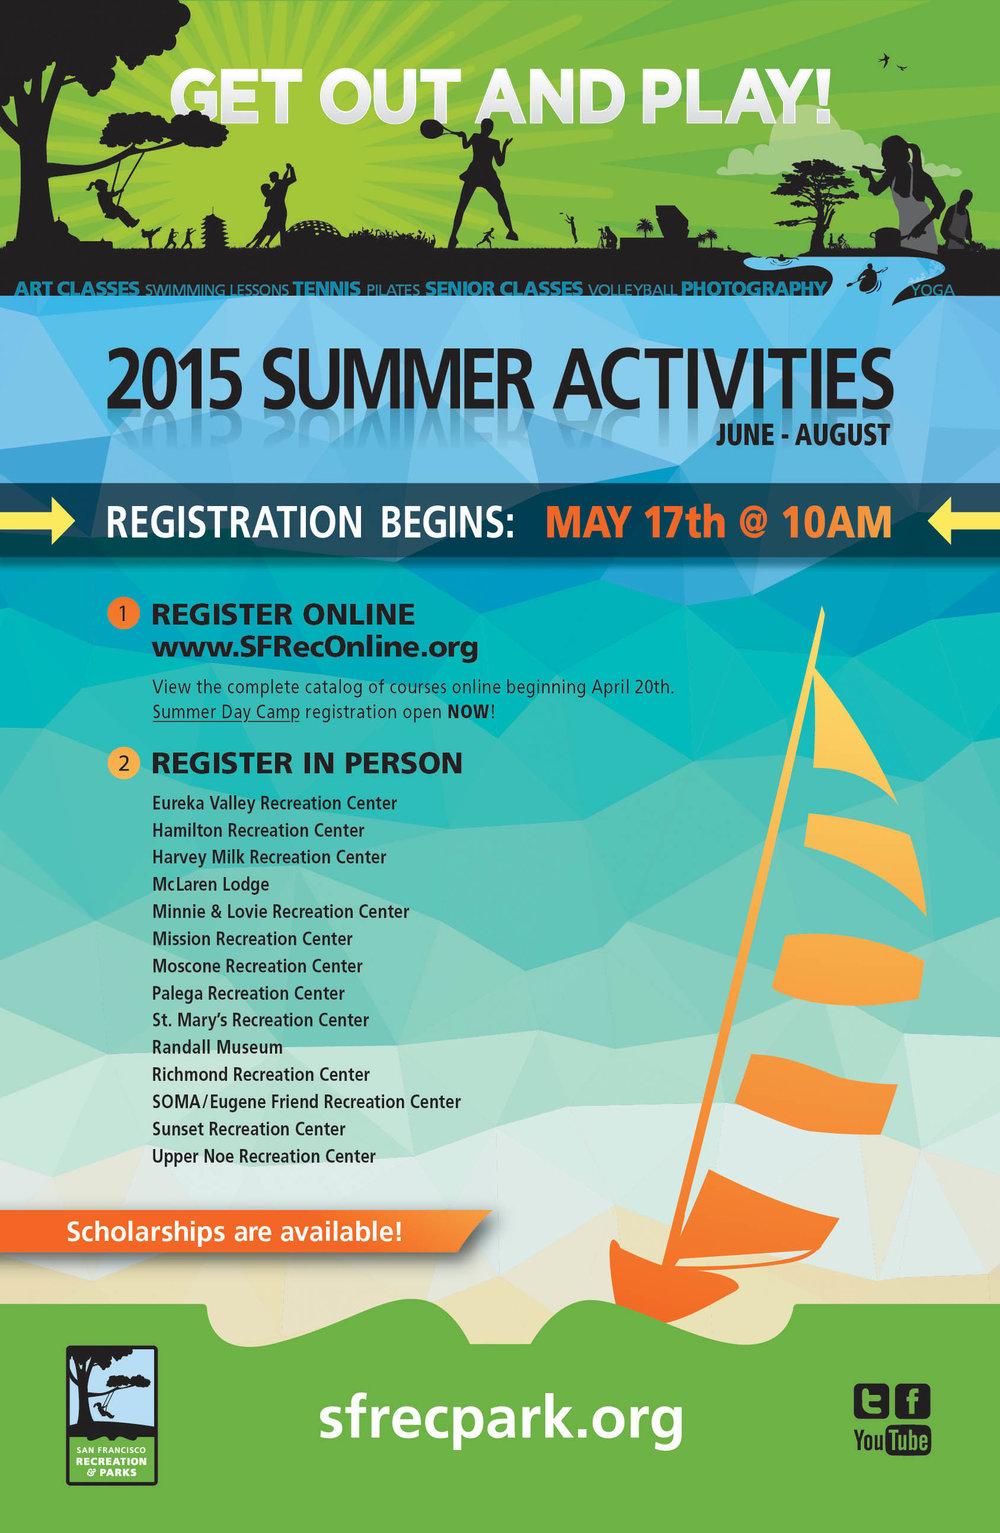 SUMMER_ACTIVITIES_POSTER_11x17_2015-01.jpg